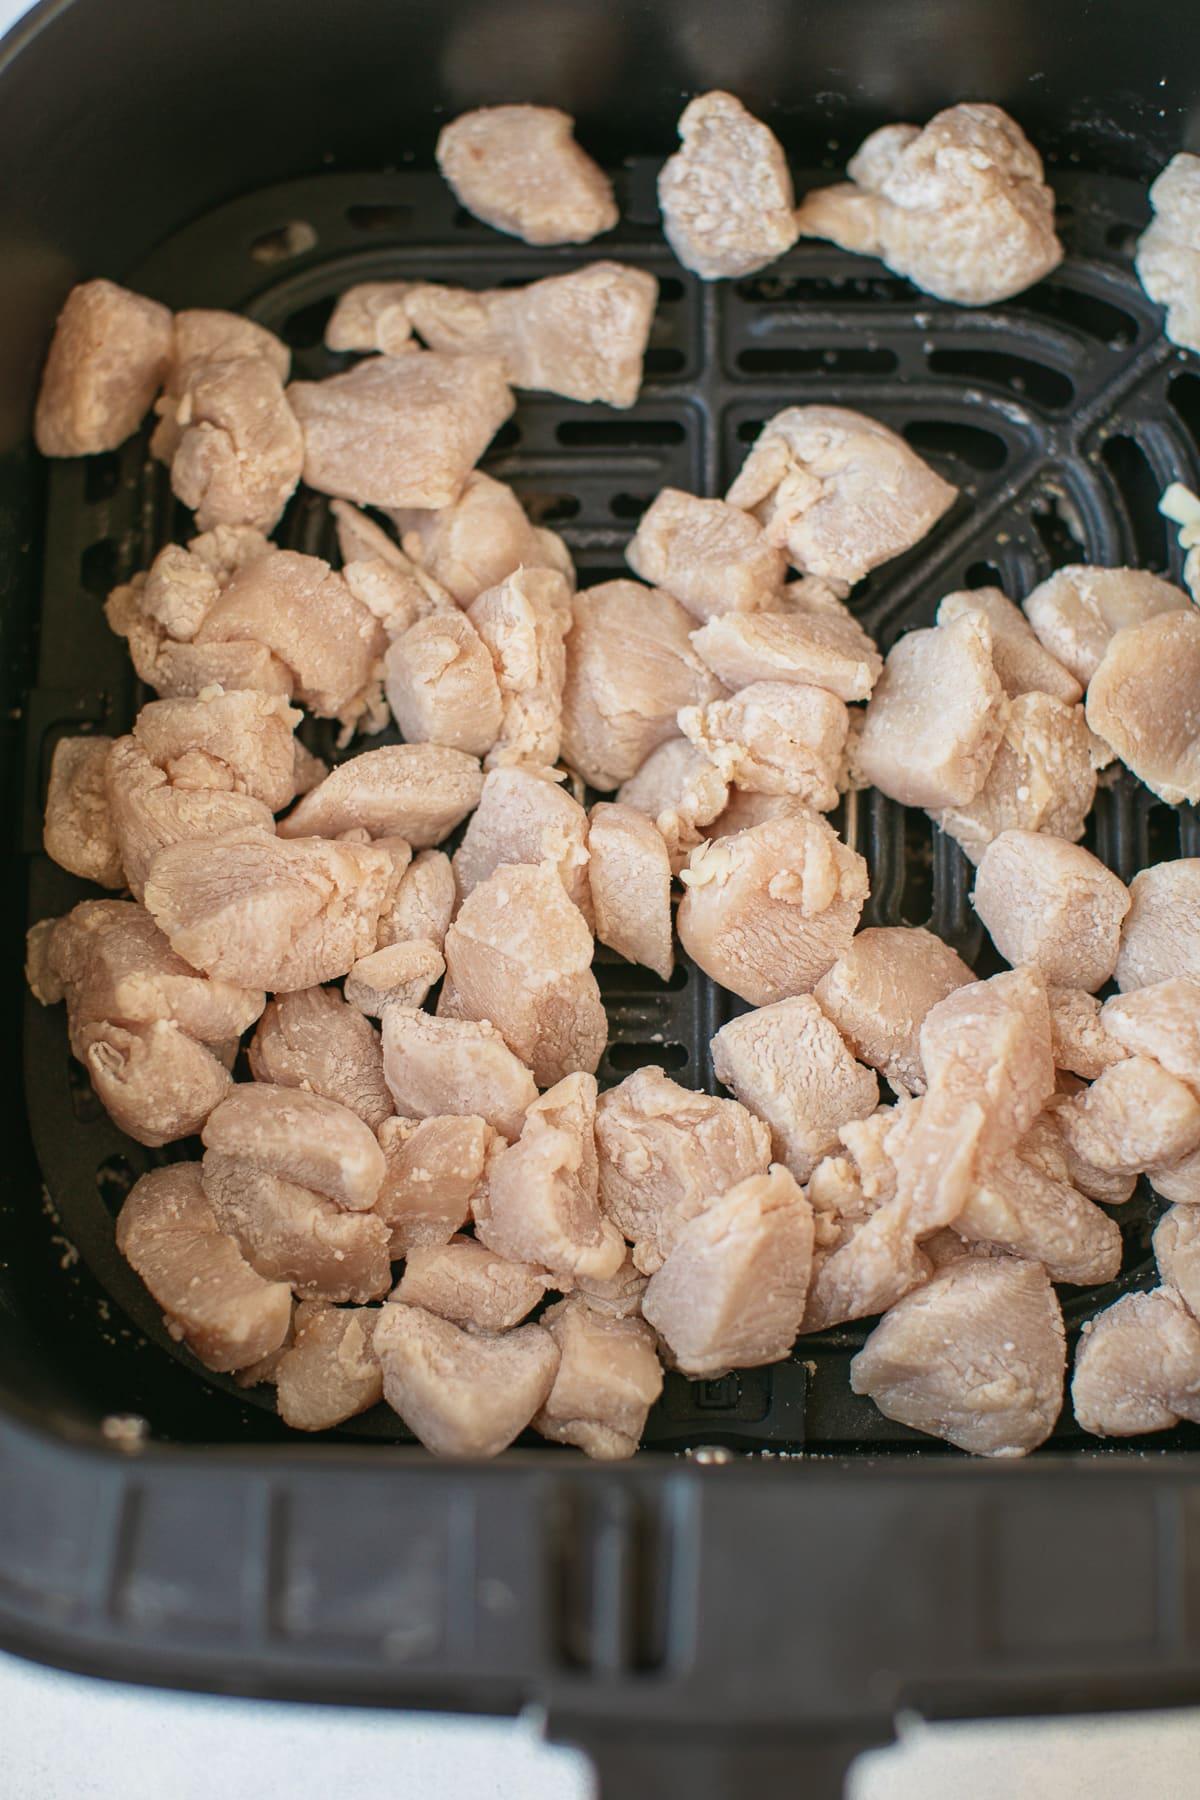 chicken in the basket of an air fryer